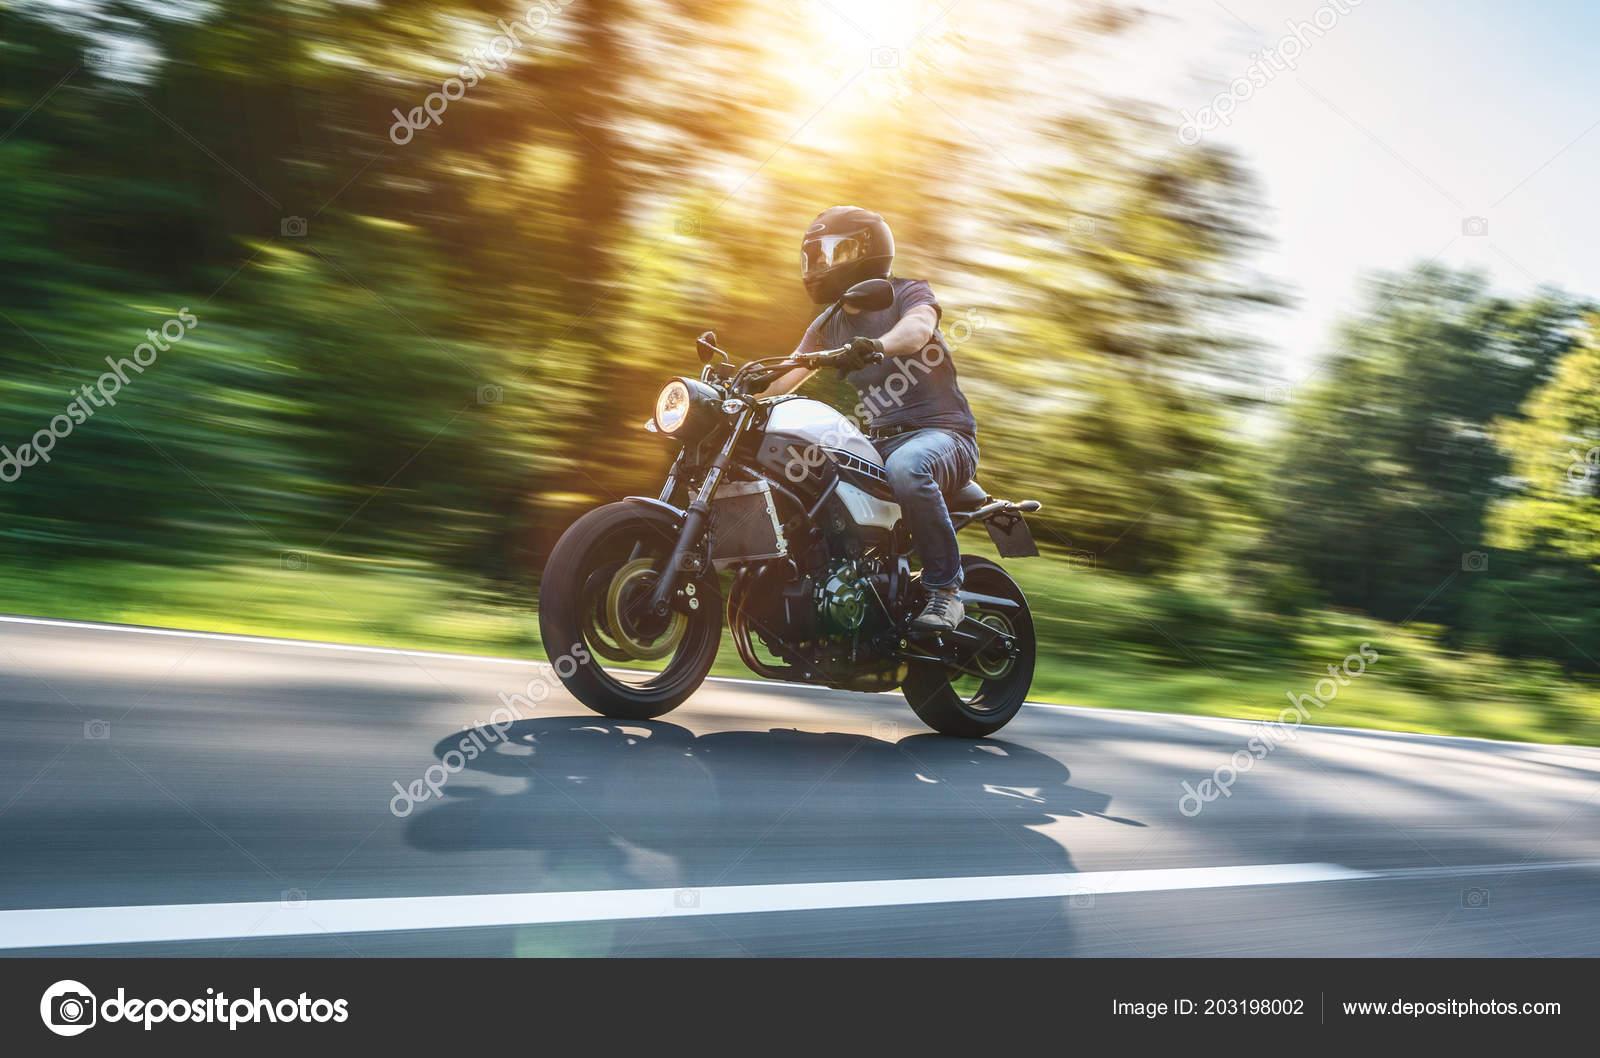 Modern Scrambler Motorbike Alpine Forest Road Fast Speed Riding Having Stock Photo